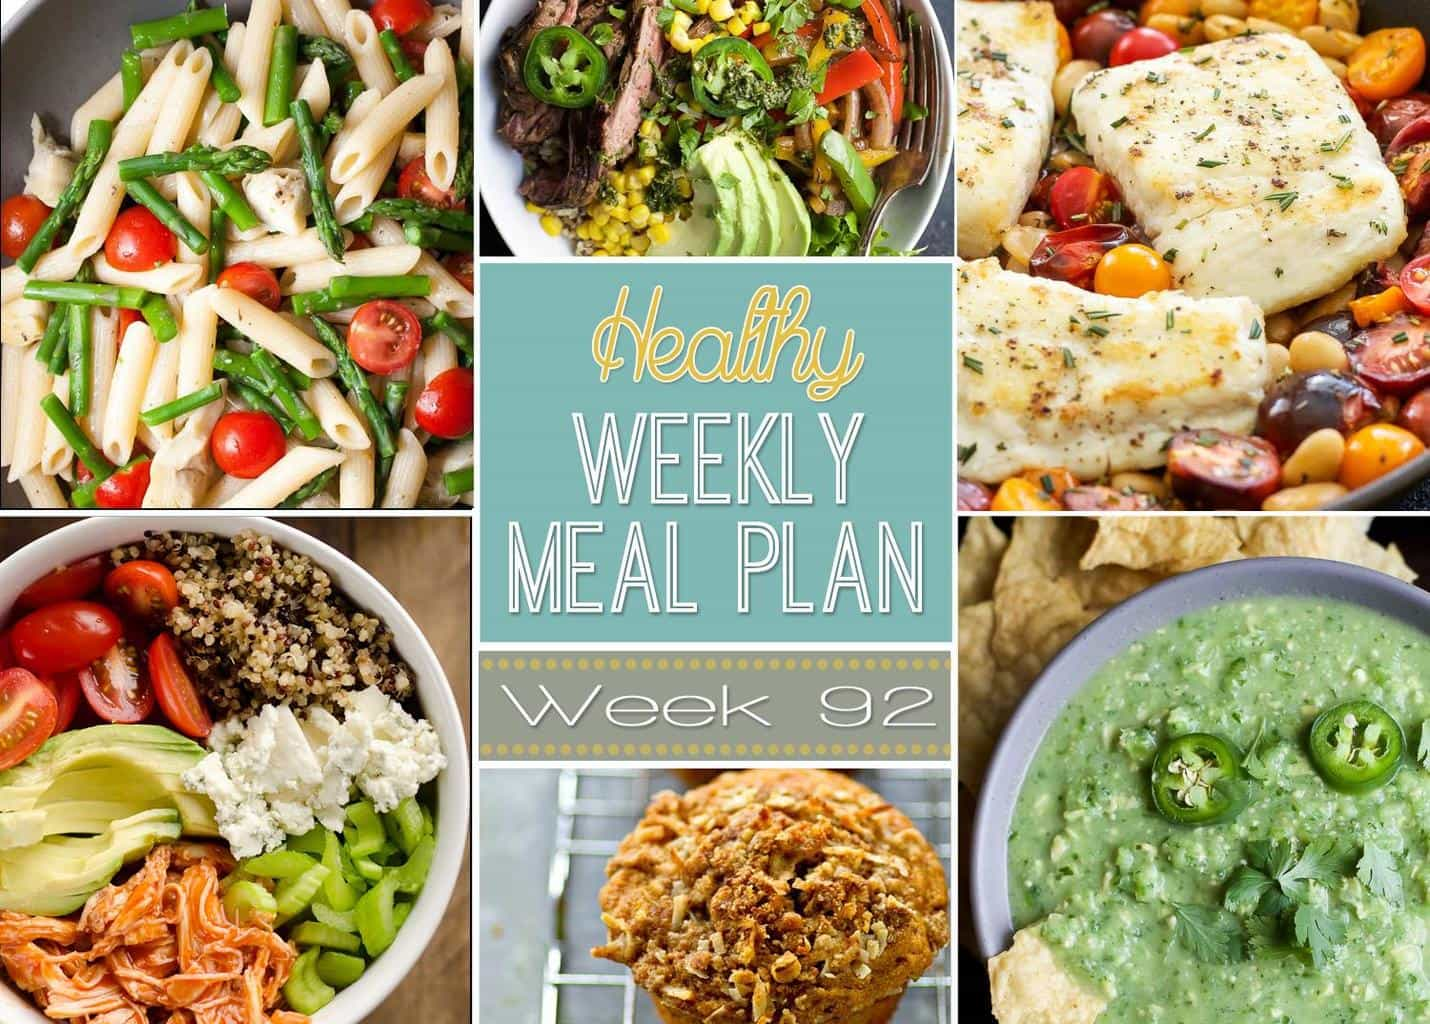 Healthy Weekly Meal Plan 92